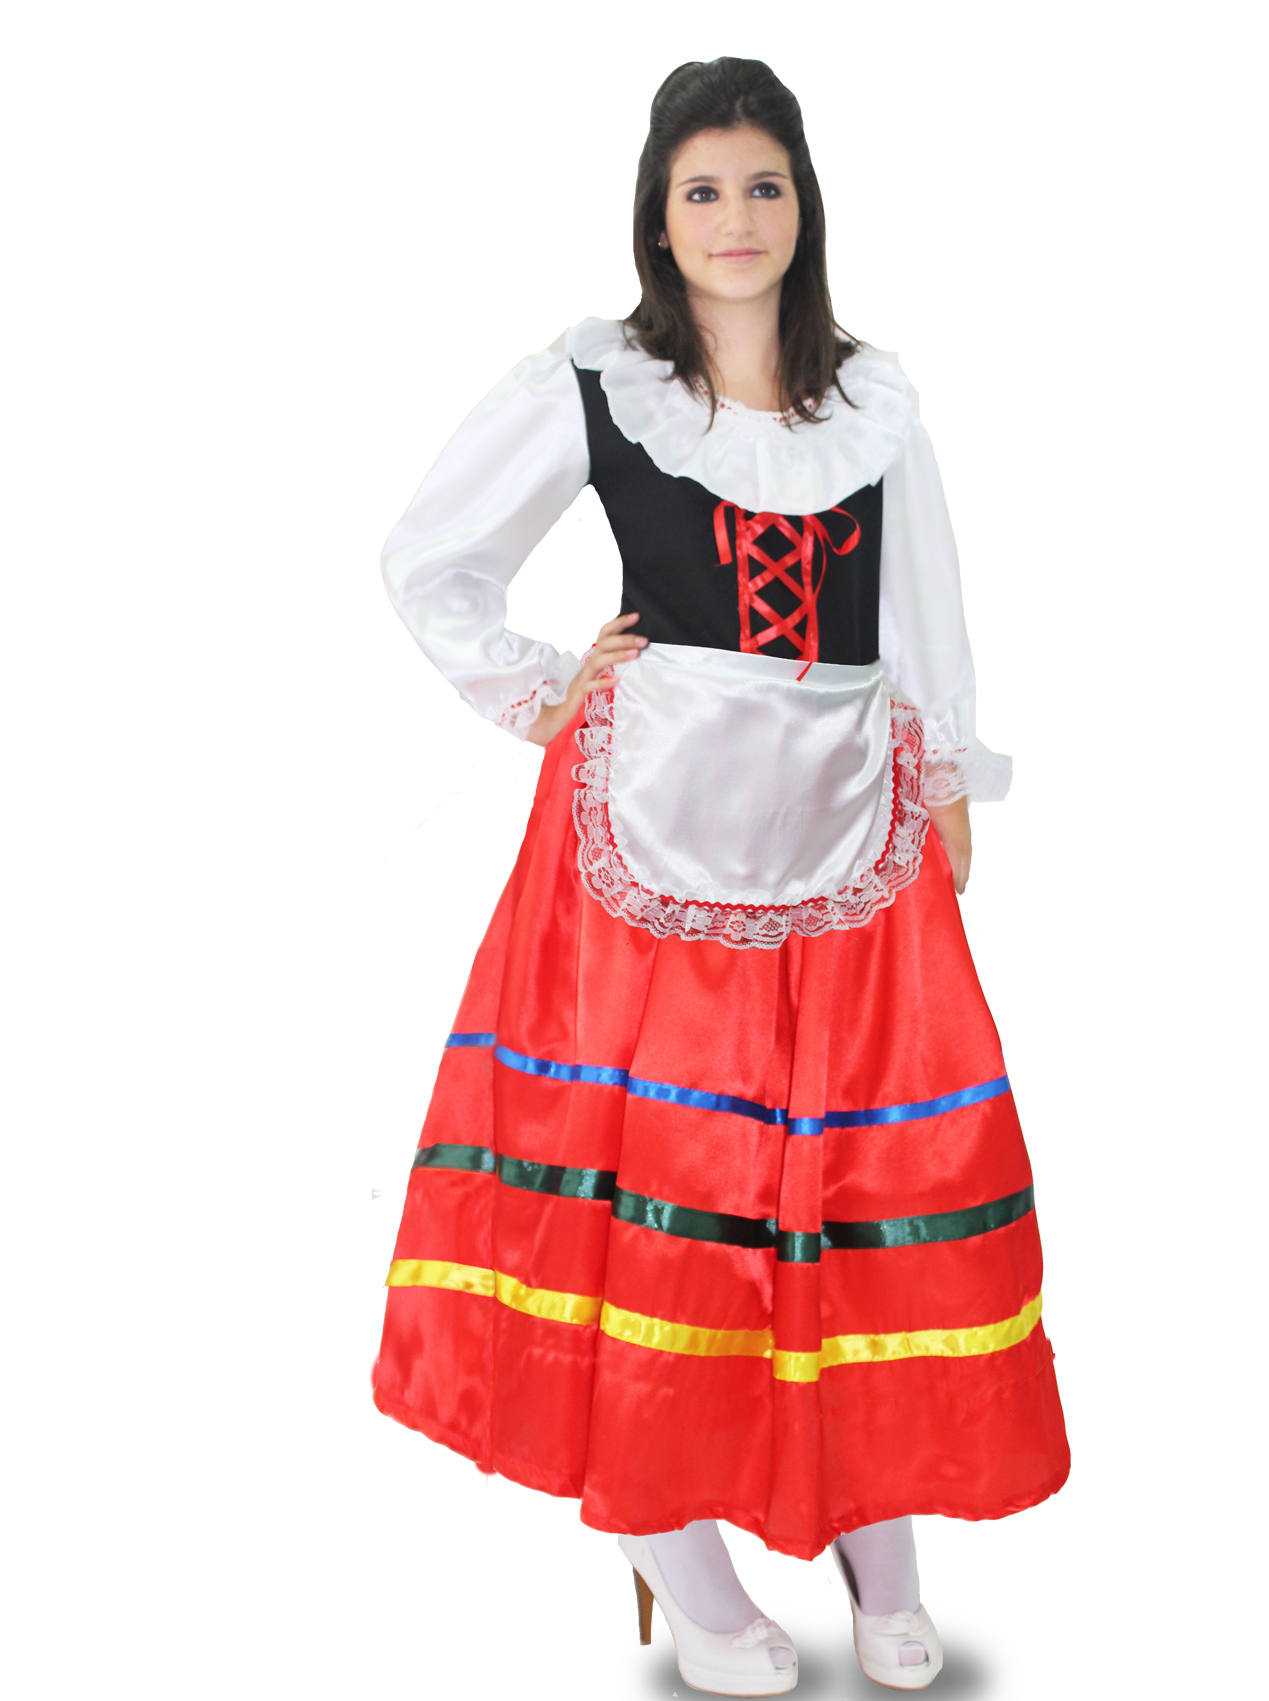 Details About Costume Dress Carnival Mask Tarantella Long Woman Adult Show Original Title